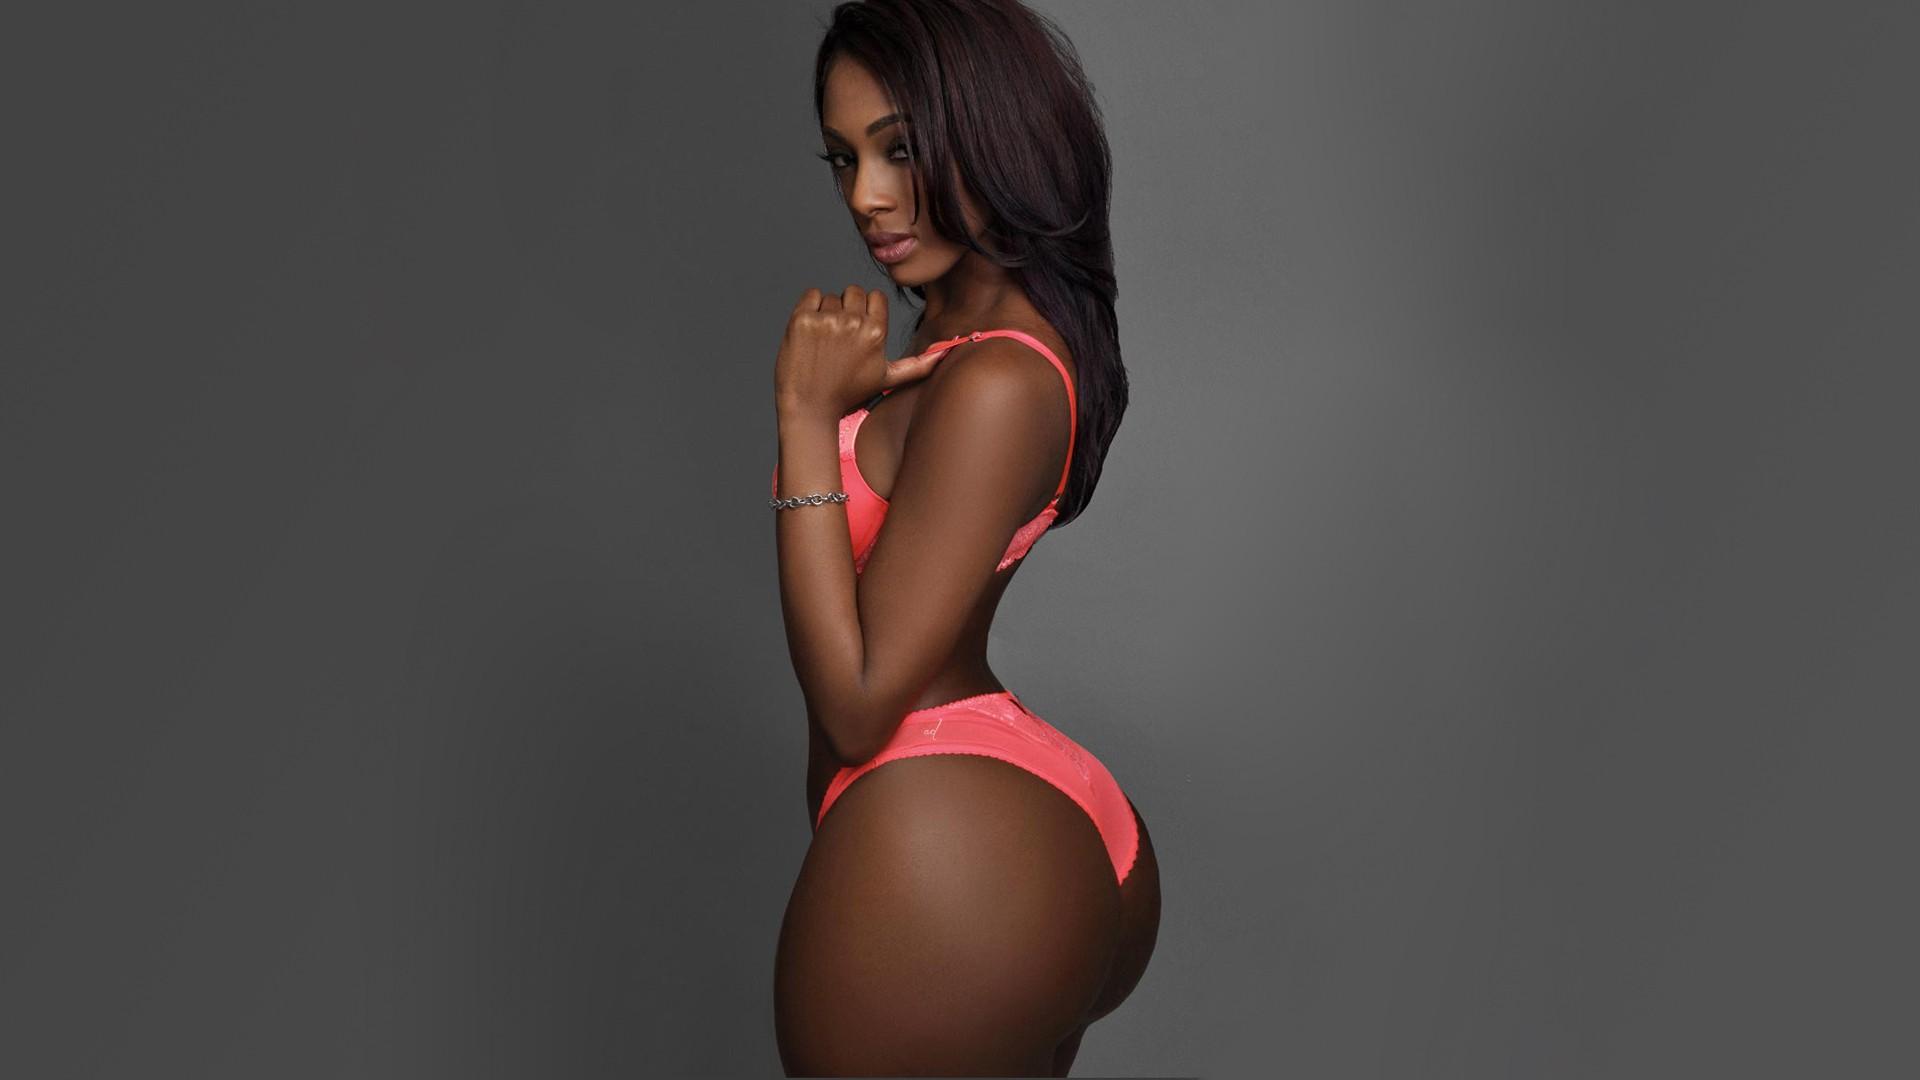 People 1920x1080 Brooke Show model brunette ass gray background ebony lingerie pink lingerie bra panties arched back